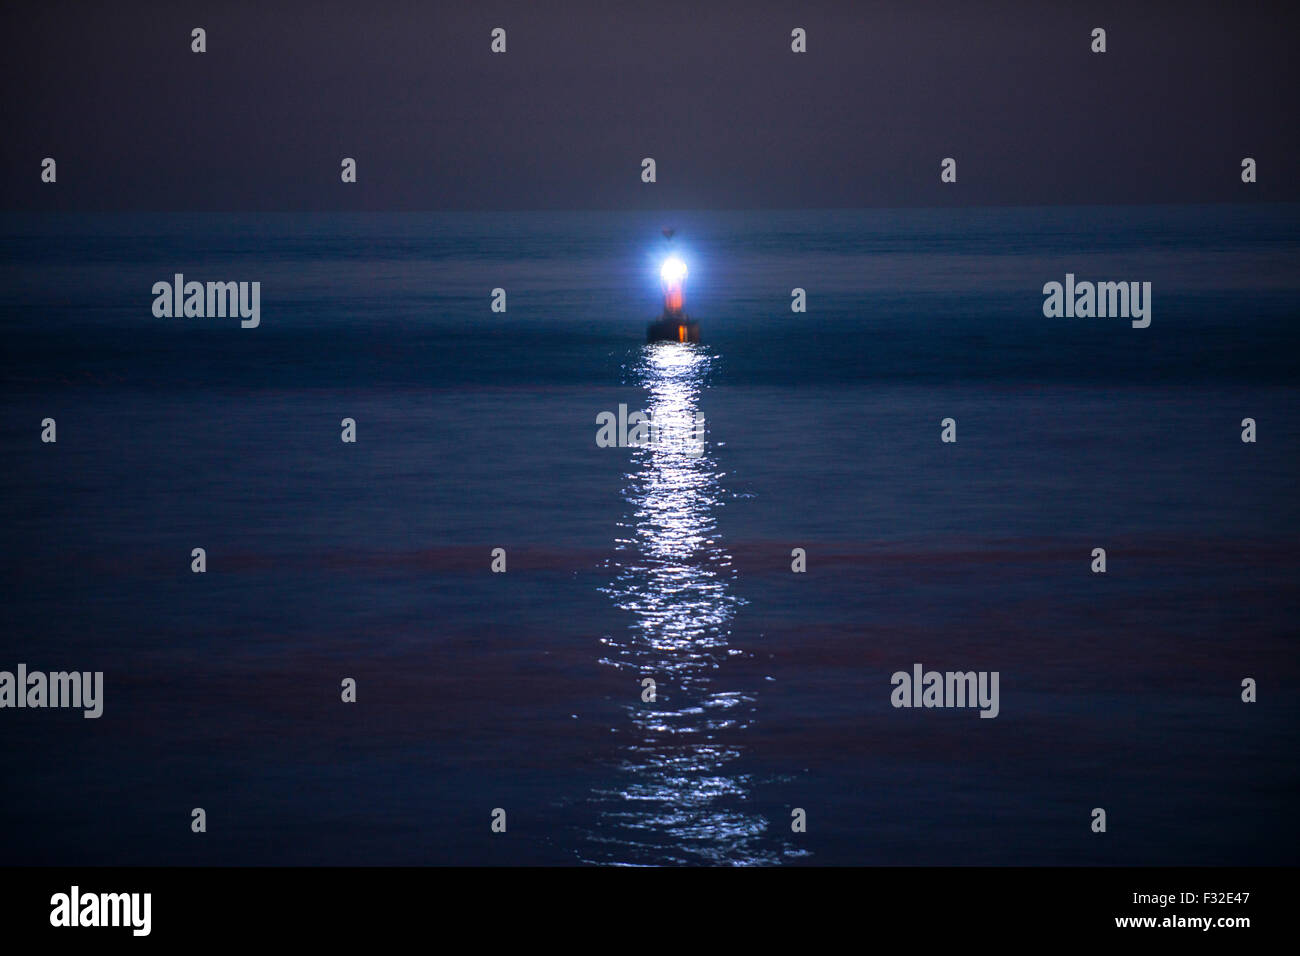 Navigation buoy at night, light reflecting on calm sea - Stock Image